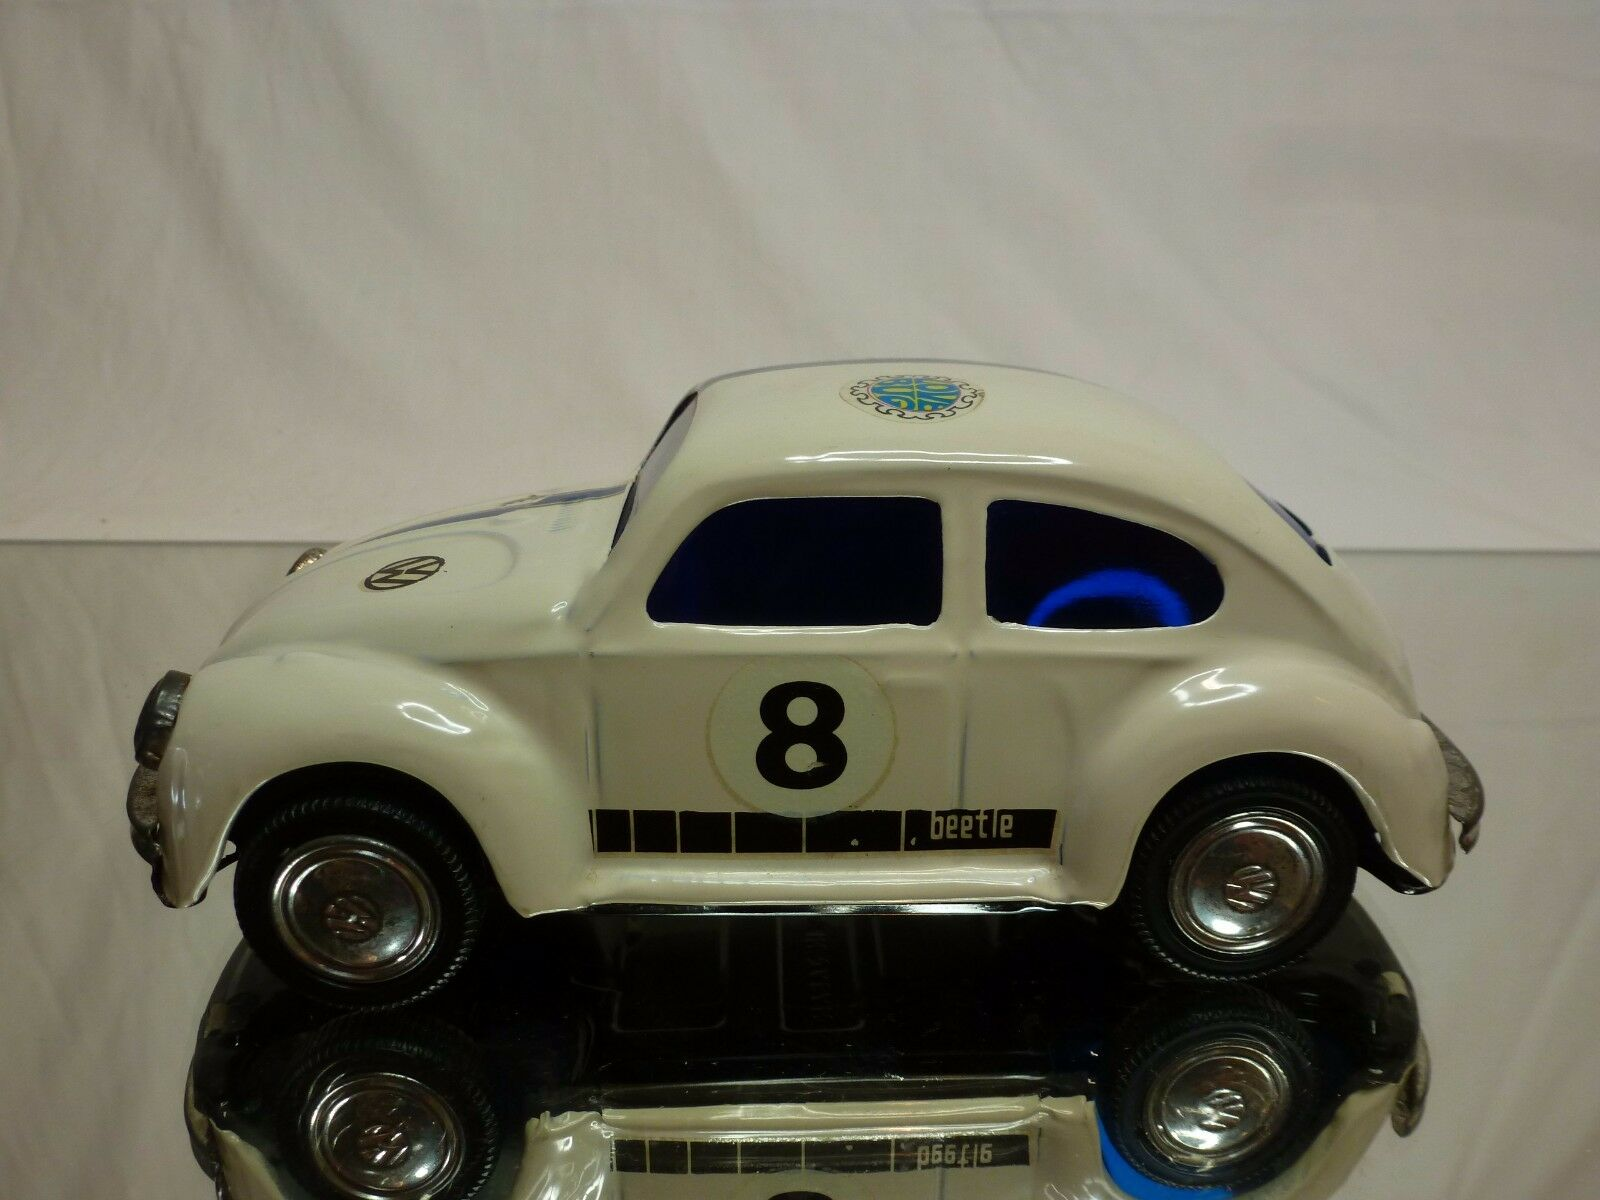 TT TT TT JAPAN TIN TOYS BLECH VW VOLKSWAGEN BEETLE - LOVE BUG L17.0cm- GOOD - FRICTION 2fa445